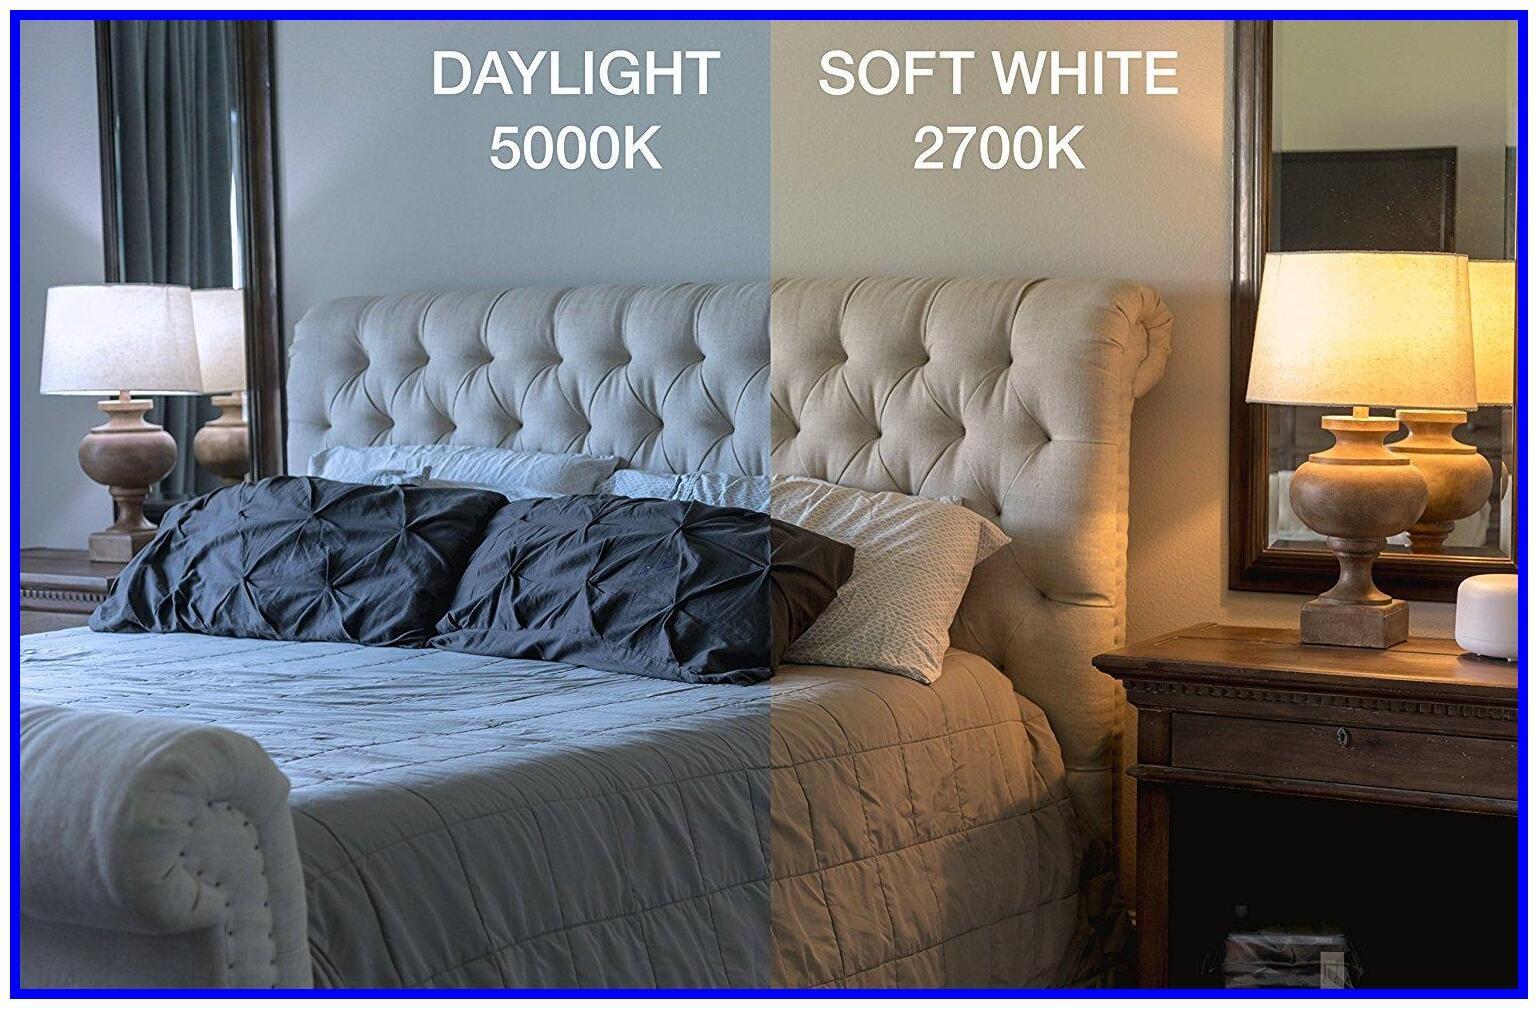 64 Reference Of Led Light Soft White Vs Daylight In 2020 Led Light Bulb Led Light Bulbs Interior Design Curtains